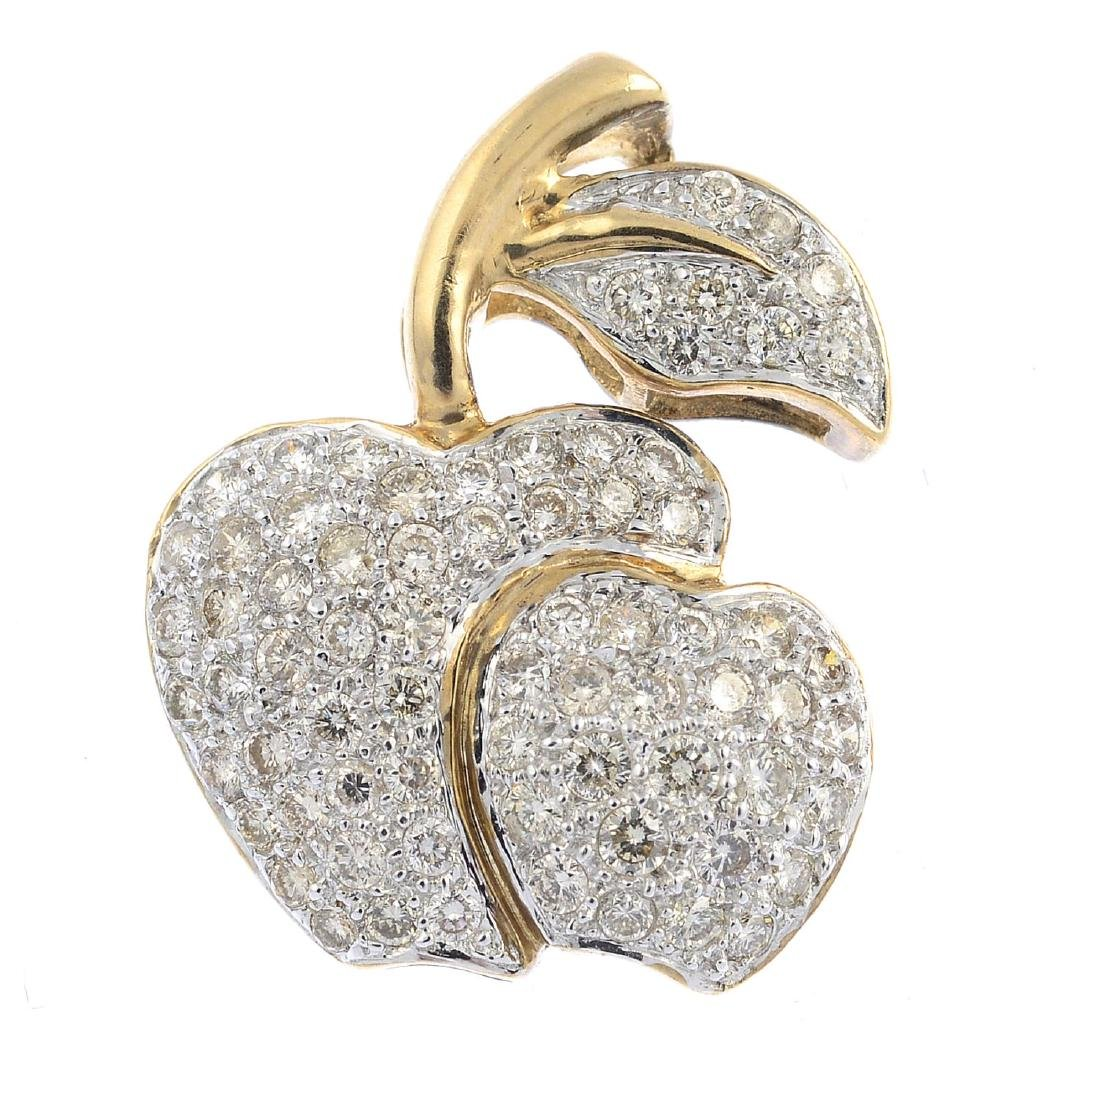 A diamond pendant. Designed as two pave-set diamond